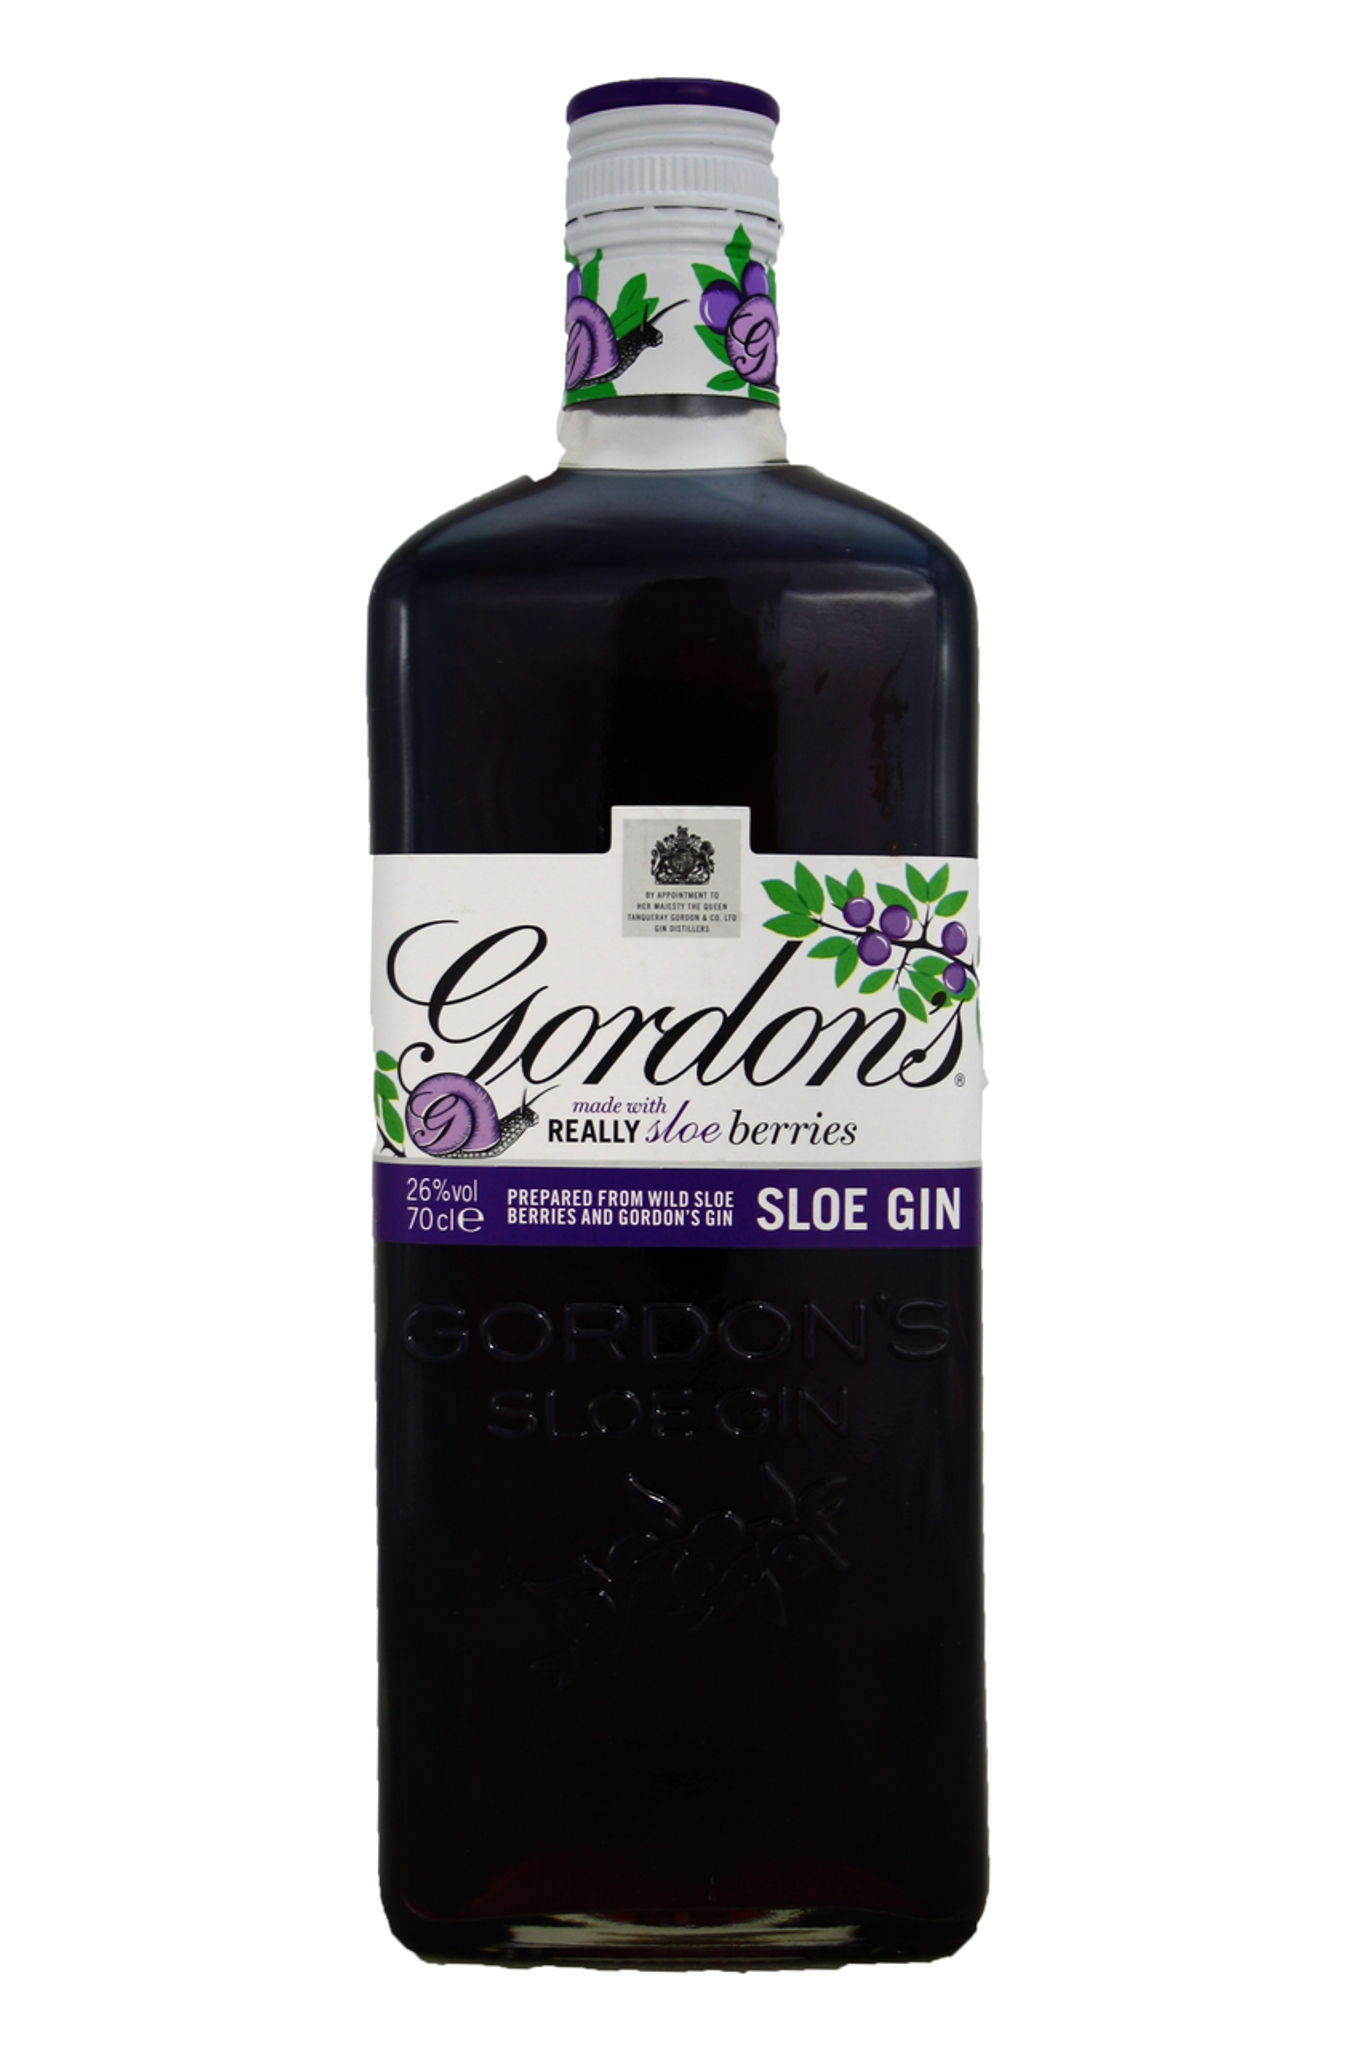 Gordons Sloe Gin >> Gordons Sloe Gin